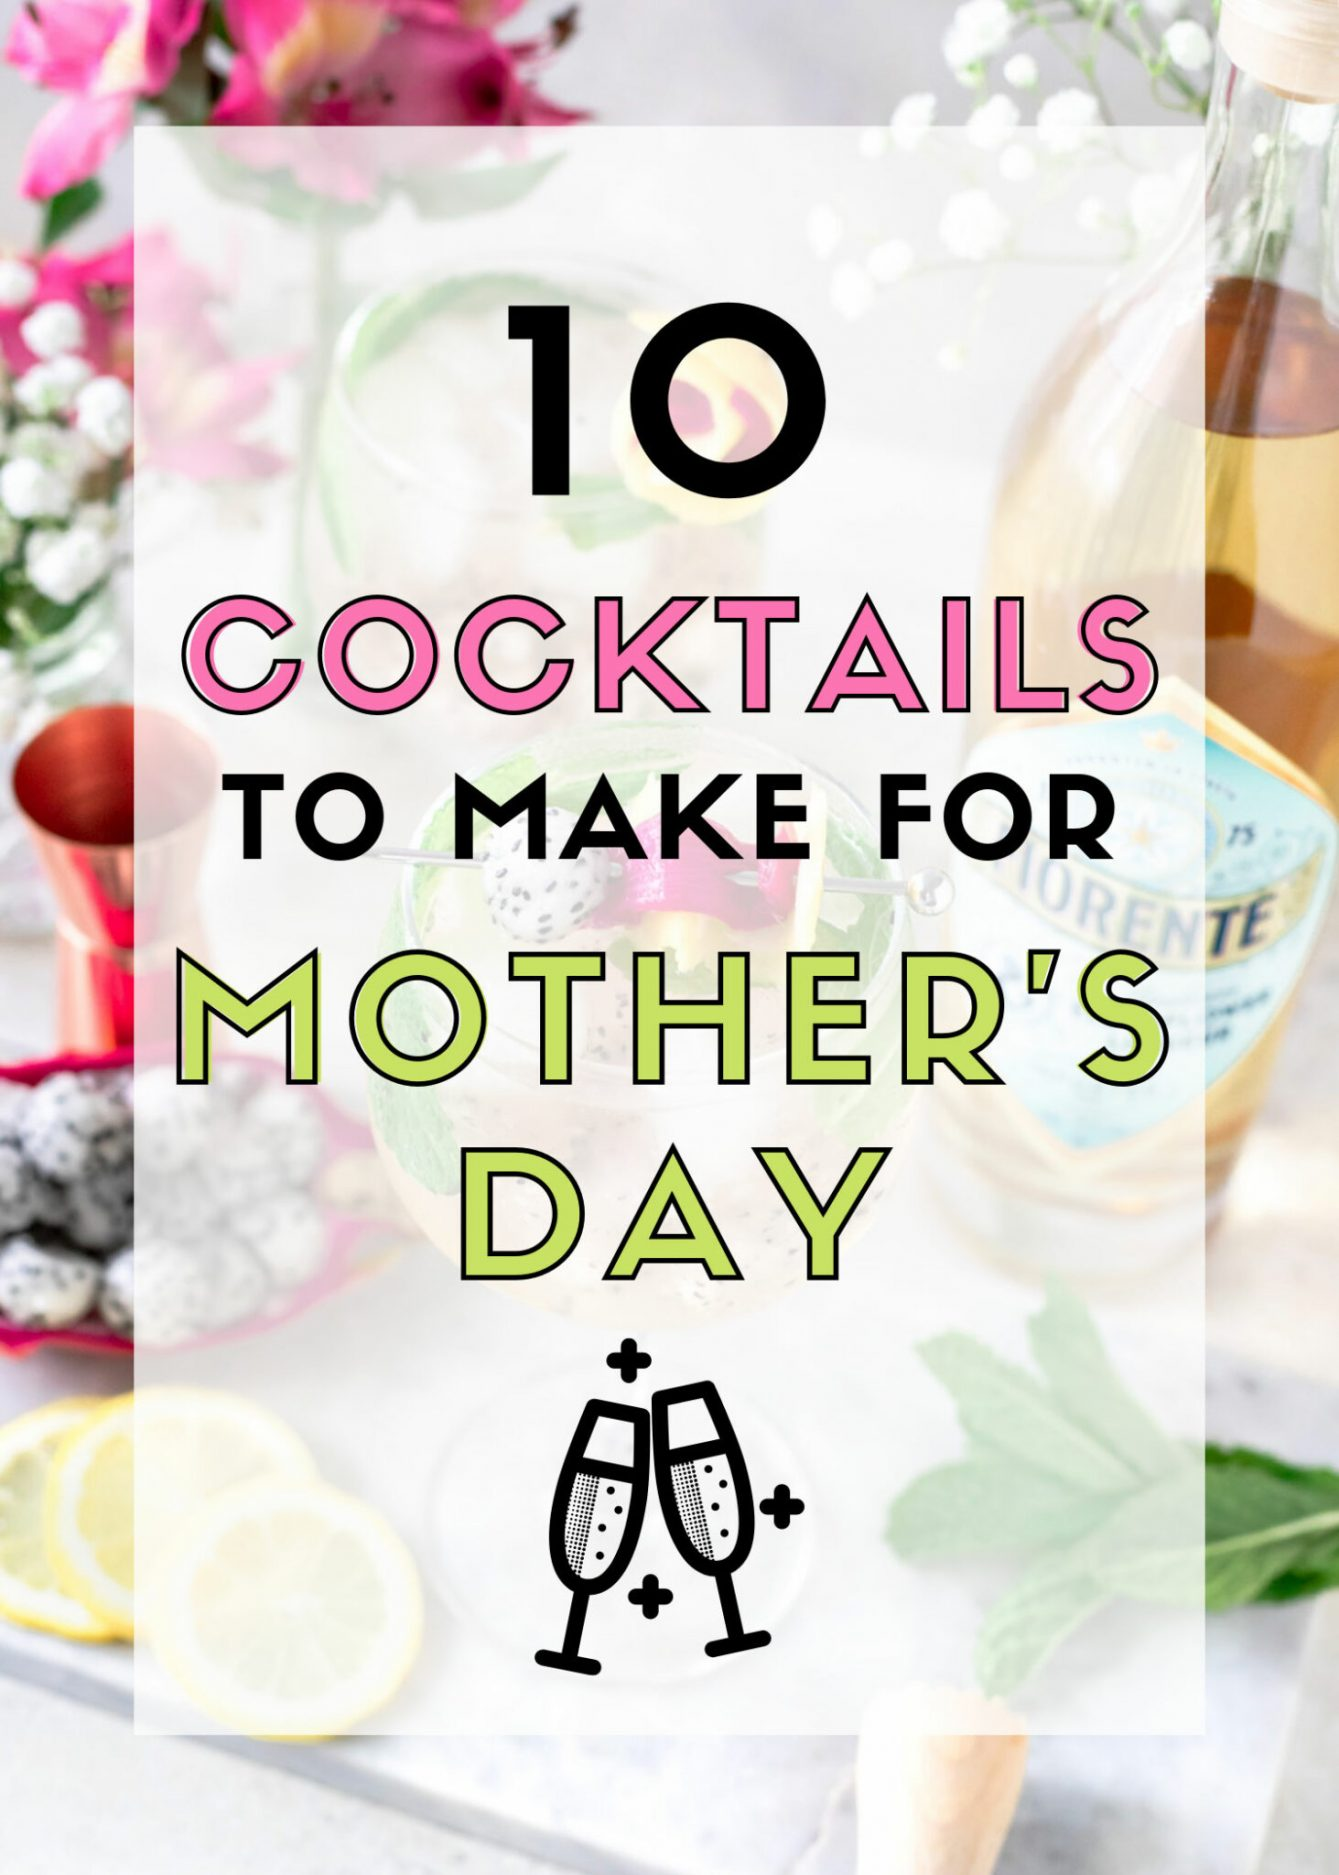 10 Cocktails To Make Mom for Mother's Day that she will love from wine cocktails to gin cocktails and even a bourbon cocktail for a bourbon loving Mom. #CocktailRecipes #ElleTalk #MothersDay #DrinkRecipes #Roundup